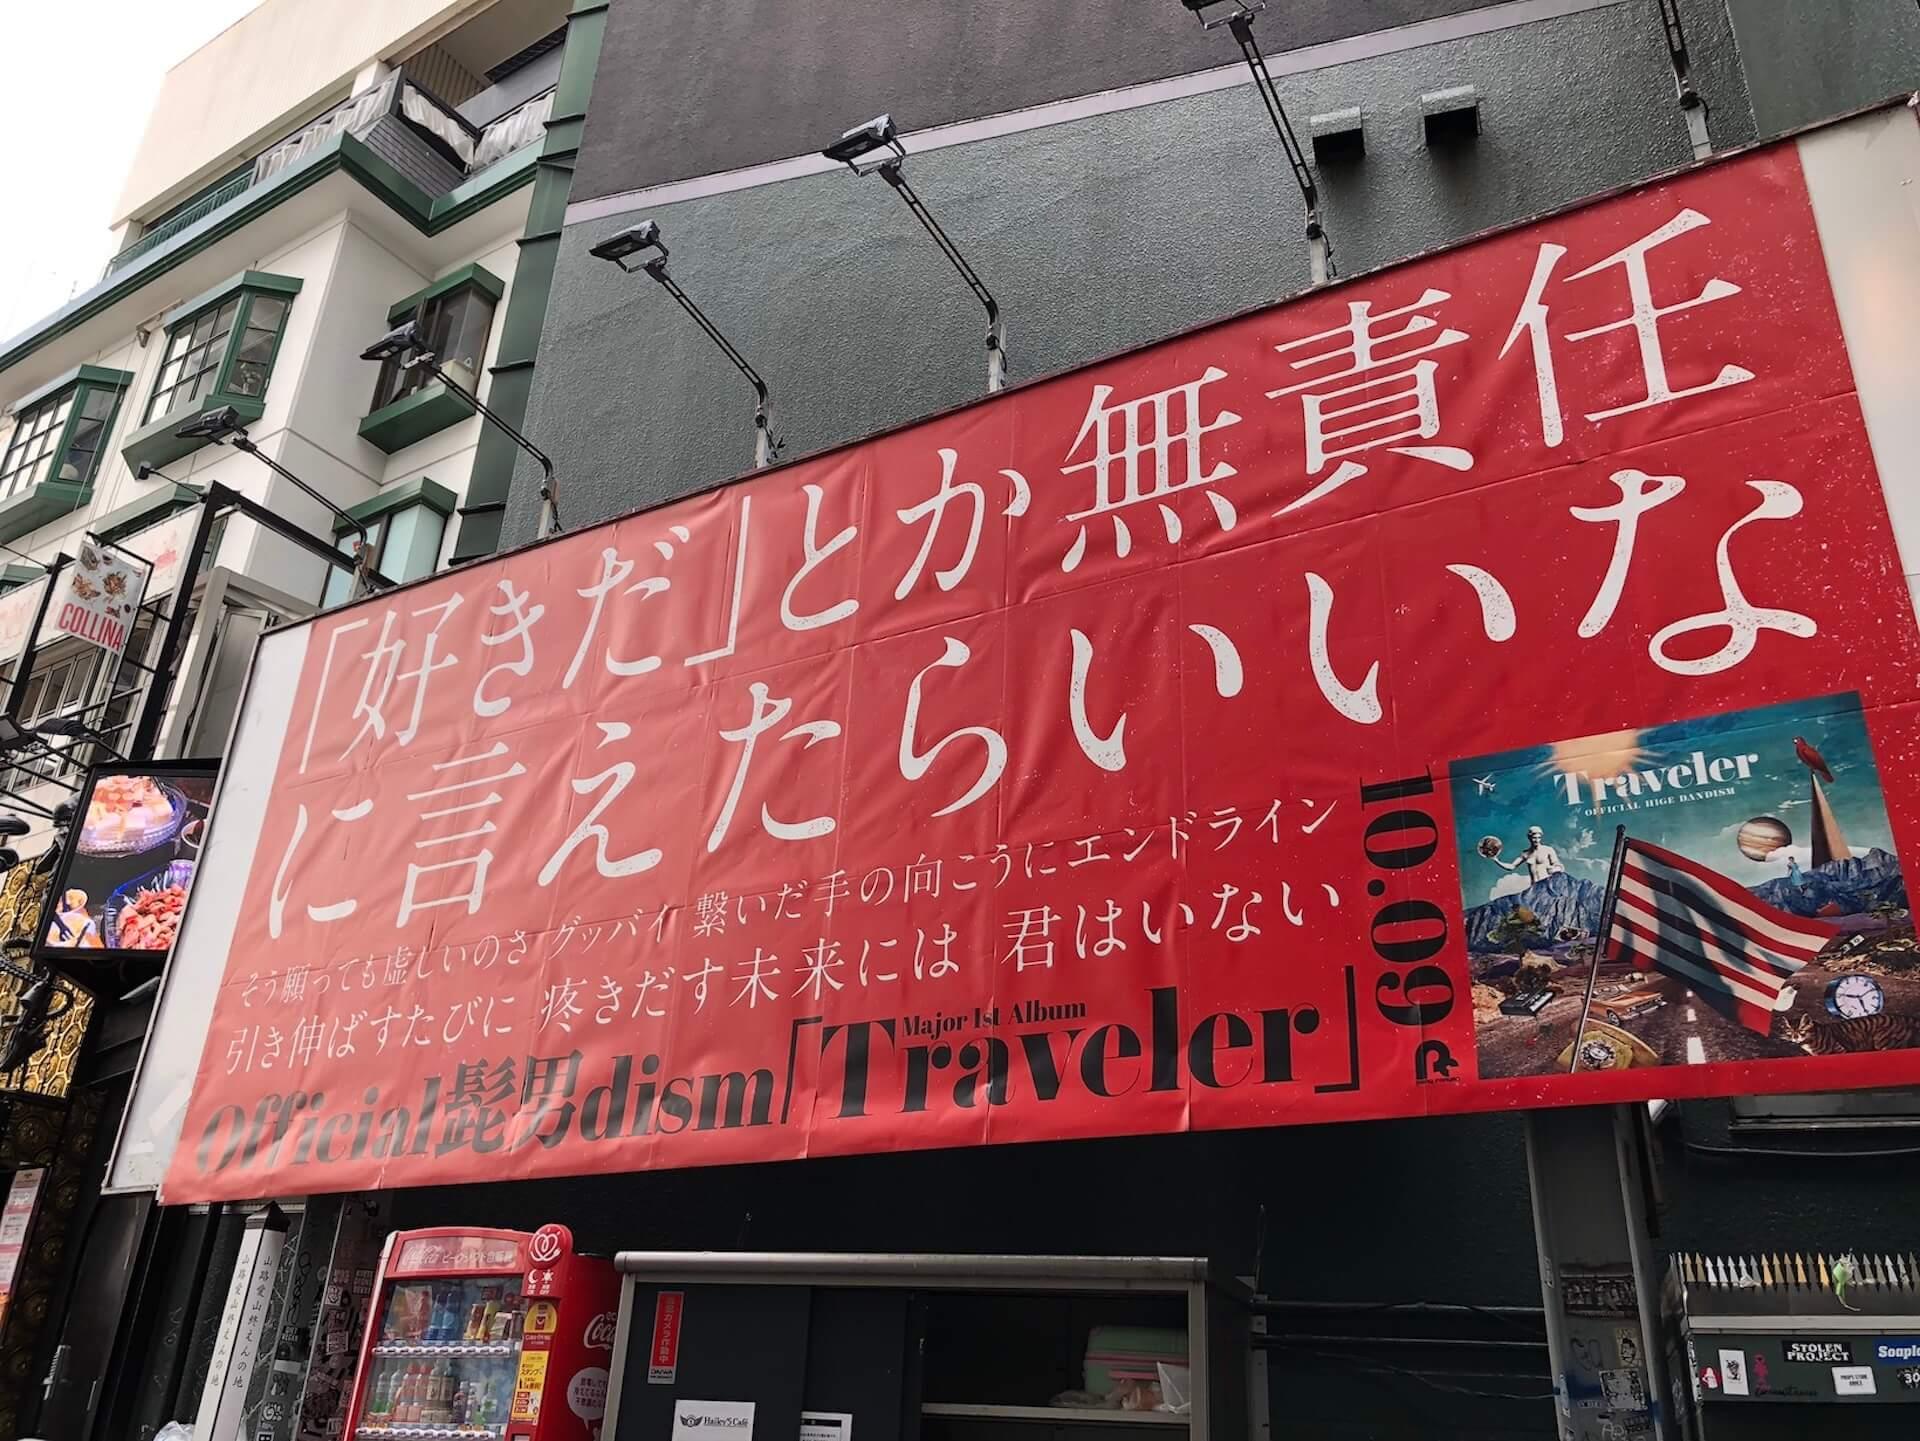 Official髭男dismが渋谷をジャック!『Traveler』発売記念、ジャックポスターが登場|渋谷某所で未発表曲の解禁も music191007_higedan_main